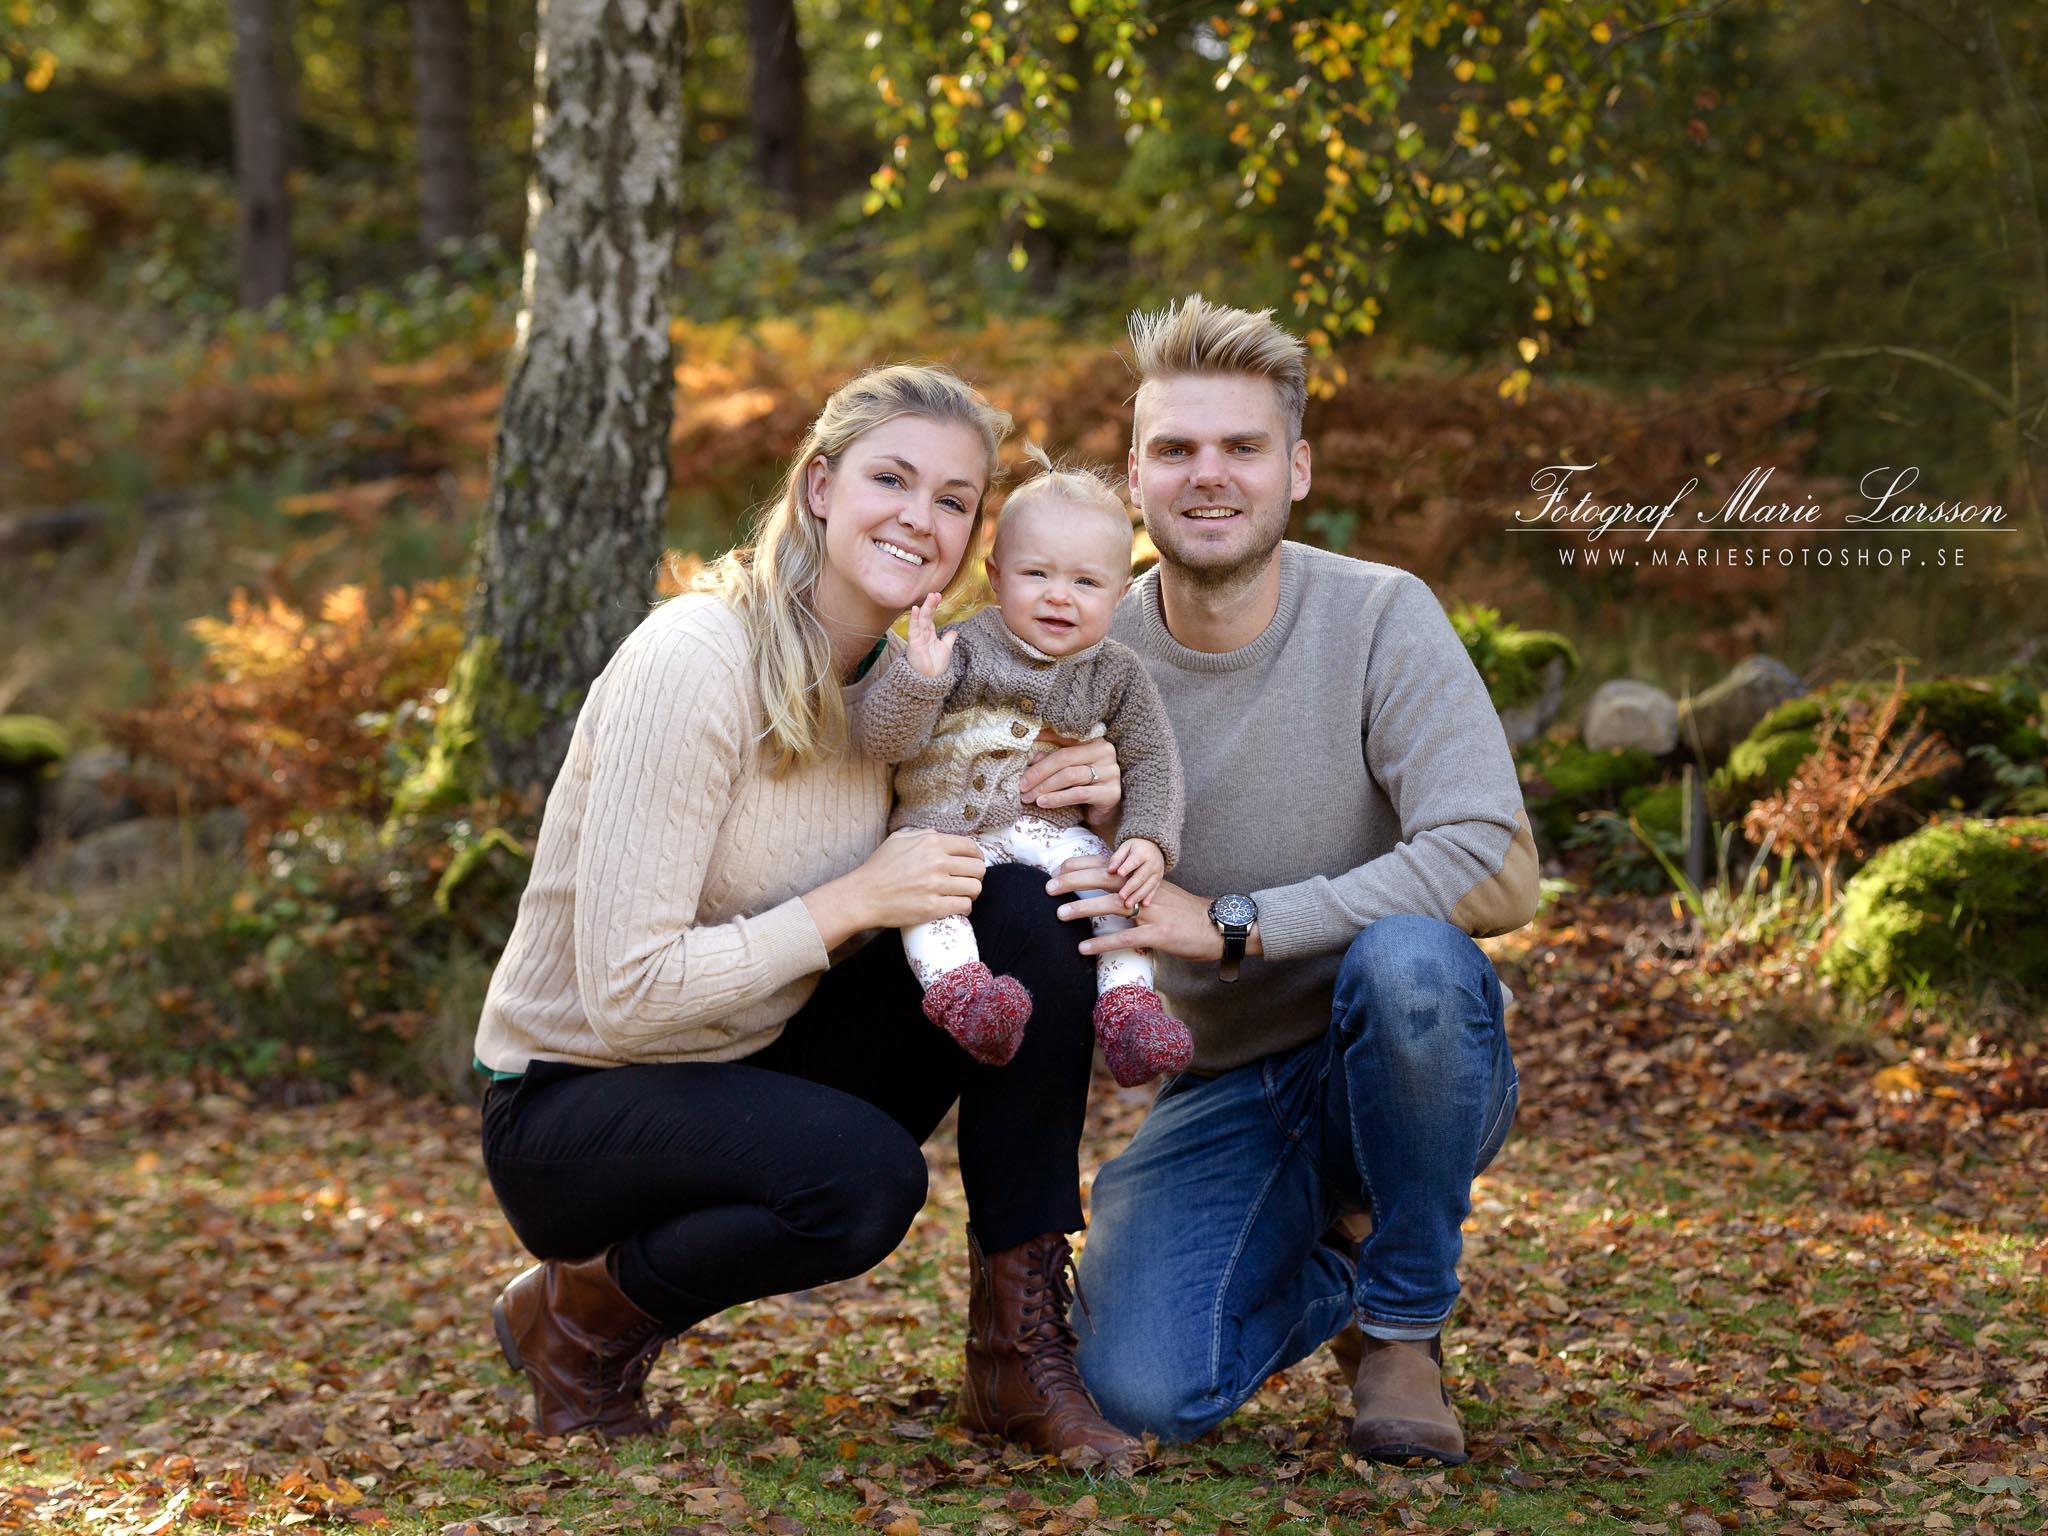 Familjefotografering, Stenungsund, Tjörn, Orust, Kungälv, Uddevalla, Ljungskile, Ödsmål, Fotograf, Barnfotografering